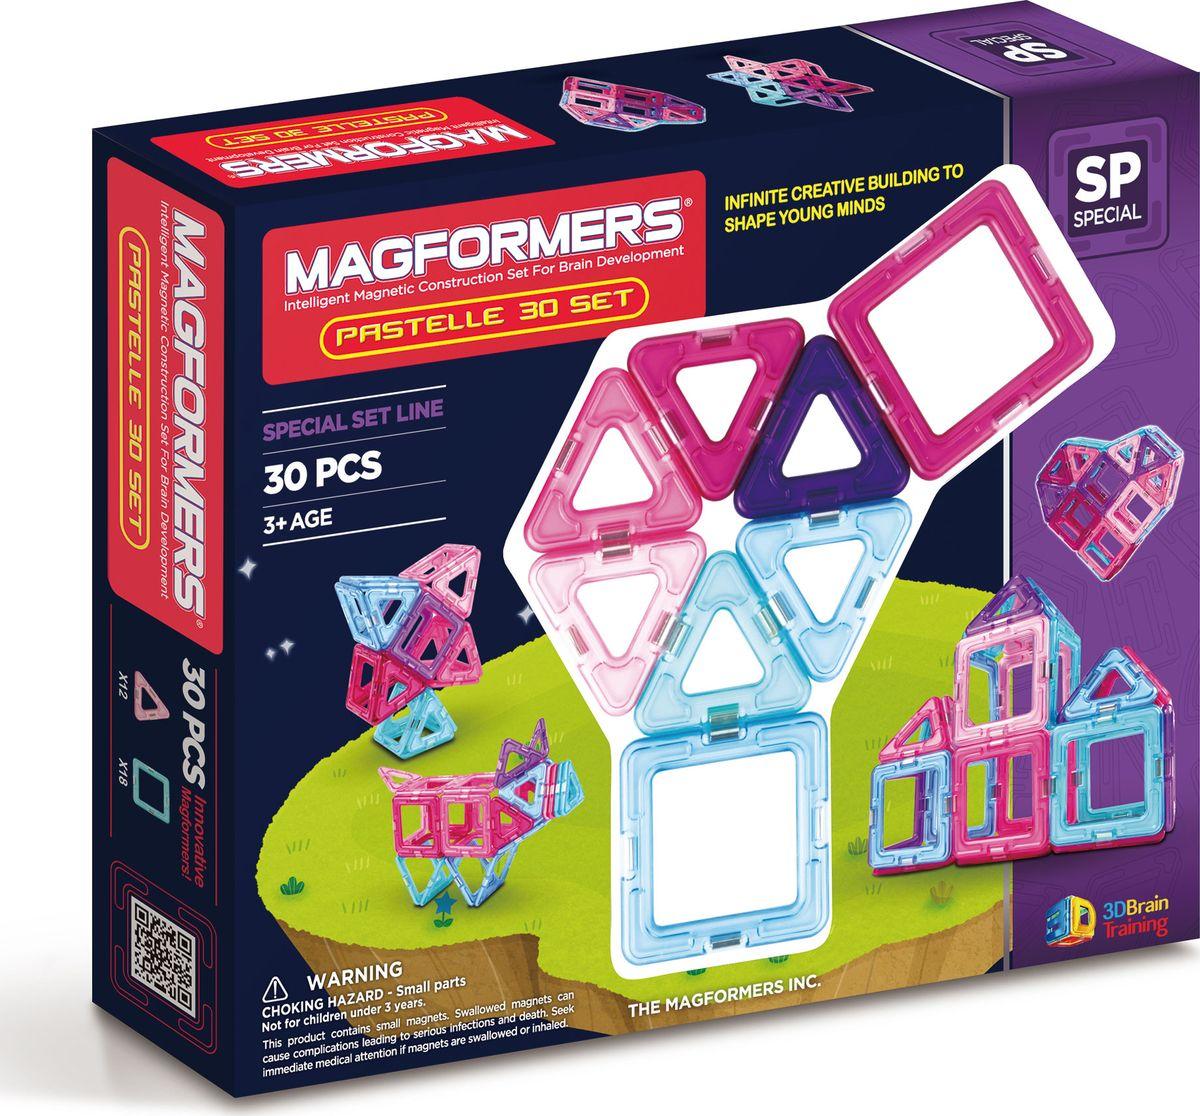 Magformers Магнитный конструктор Pastelle 30